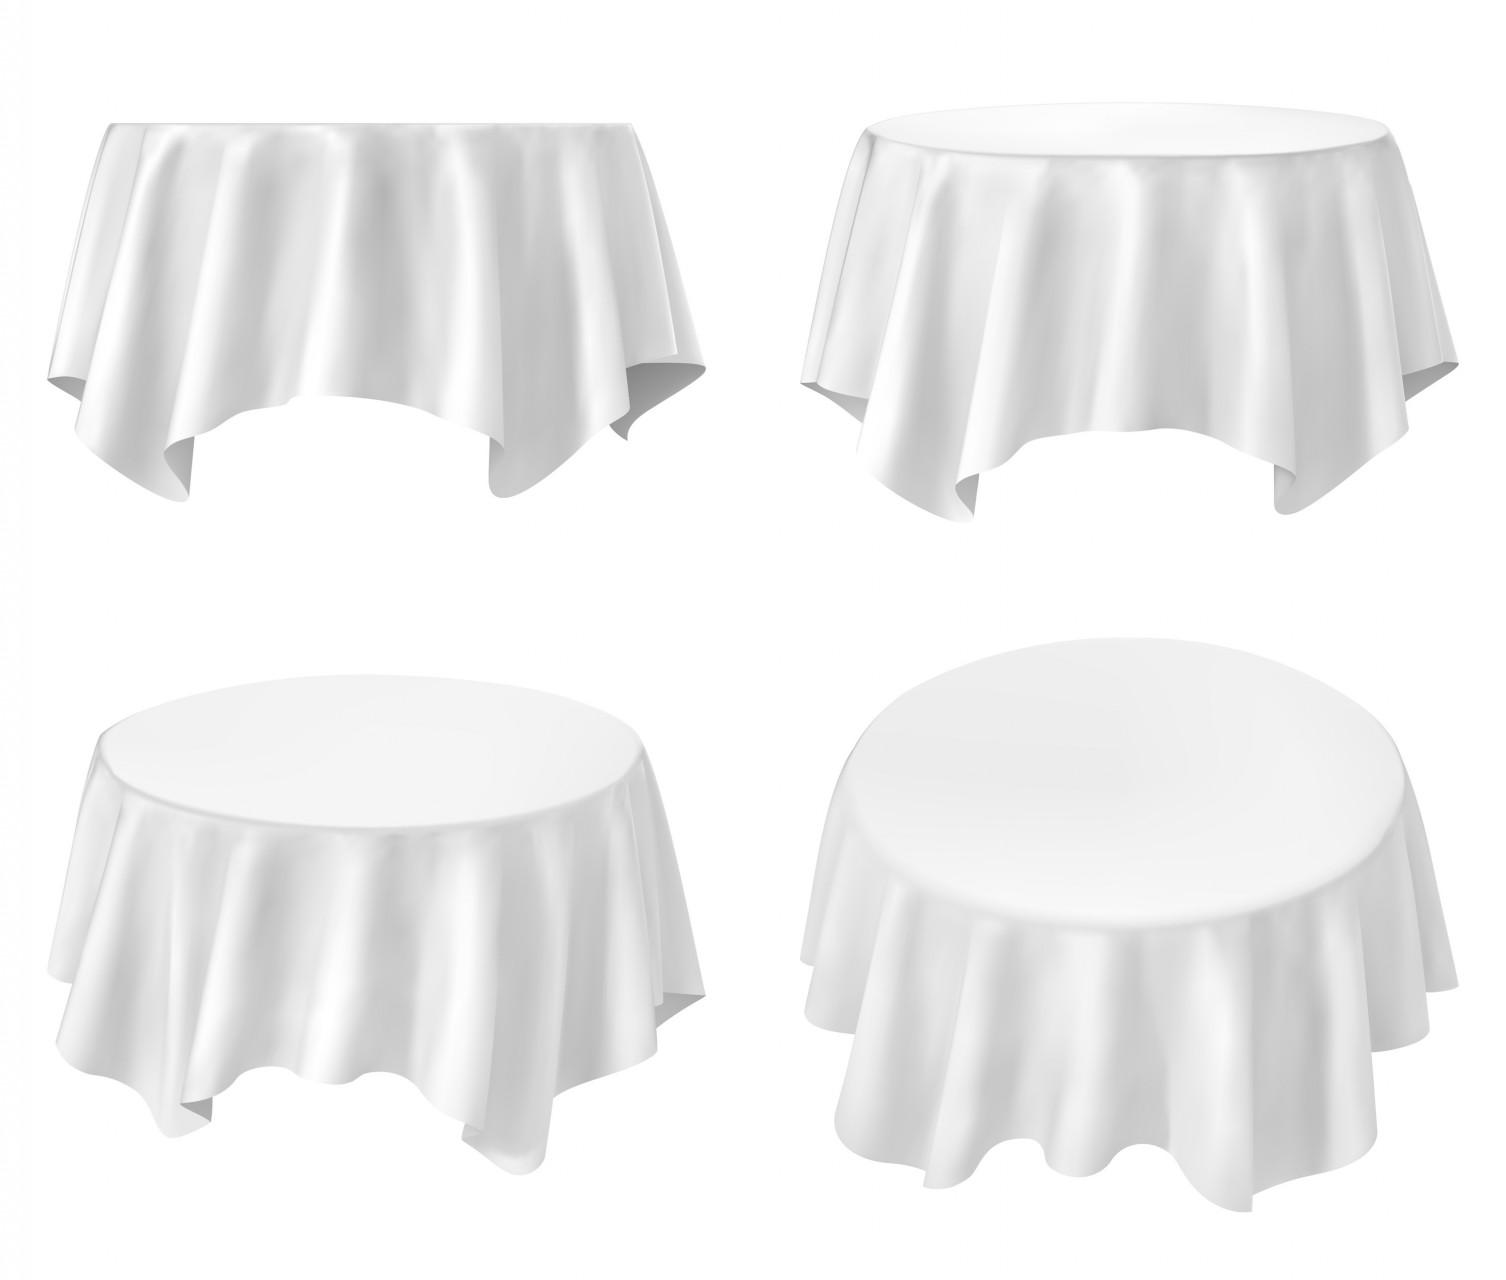 White round tablecloths cheap - White Round Tablecloth